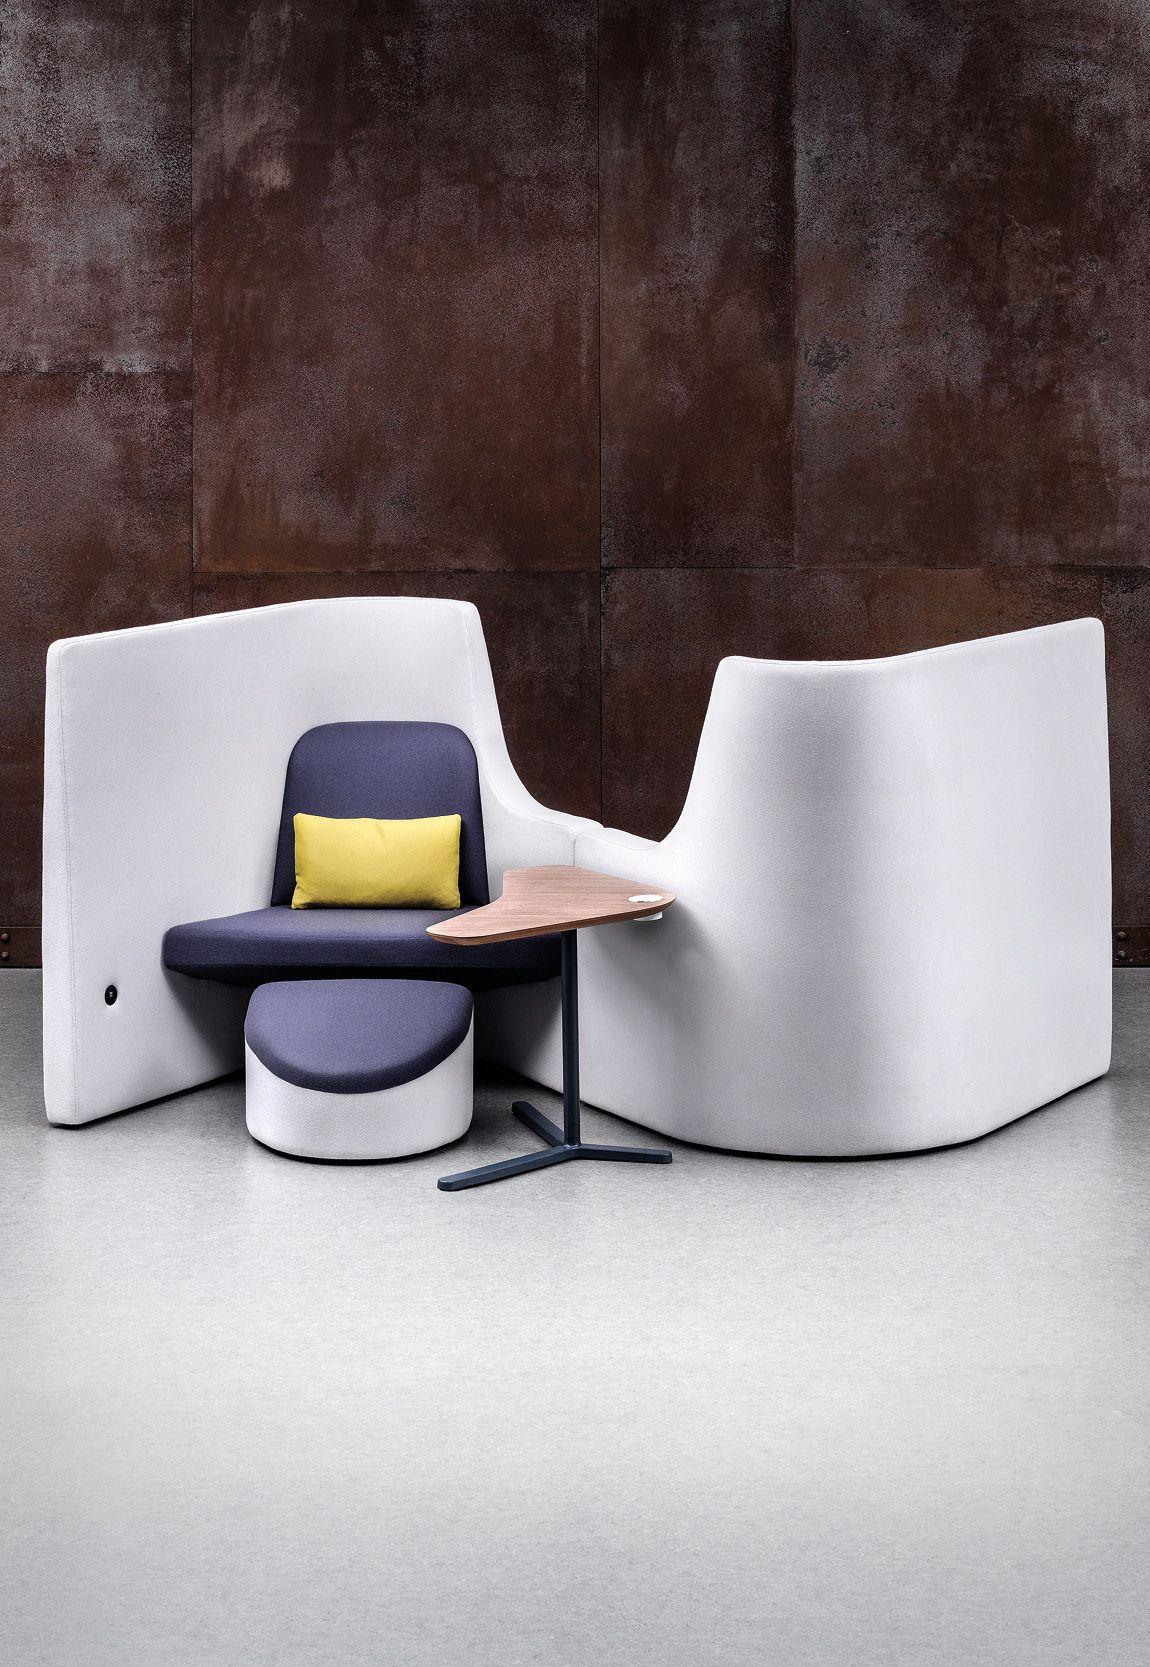 Vee By Allermuir Chairs Furniture Furniture Showroom